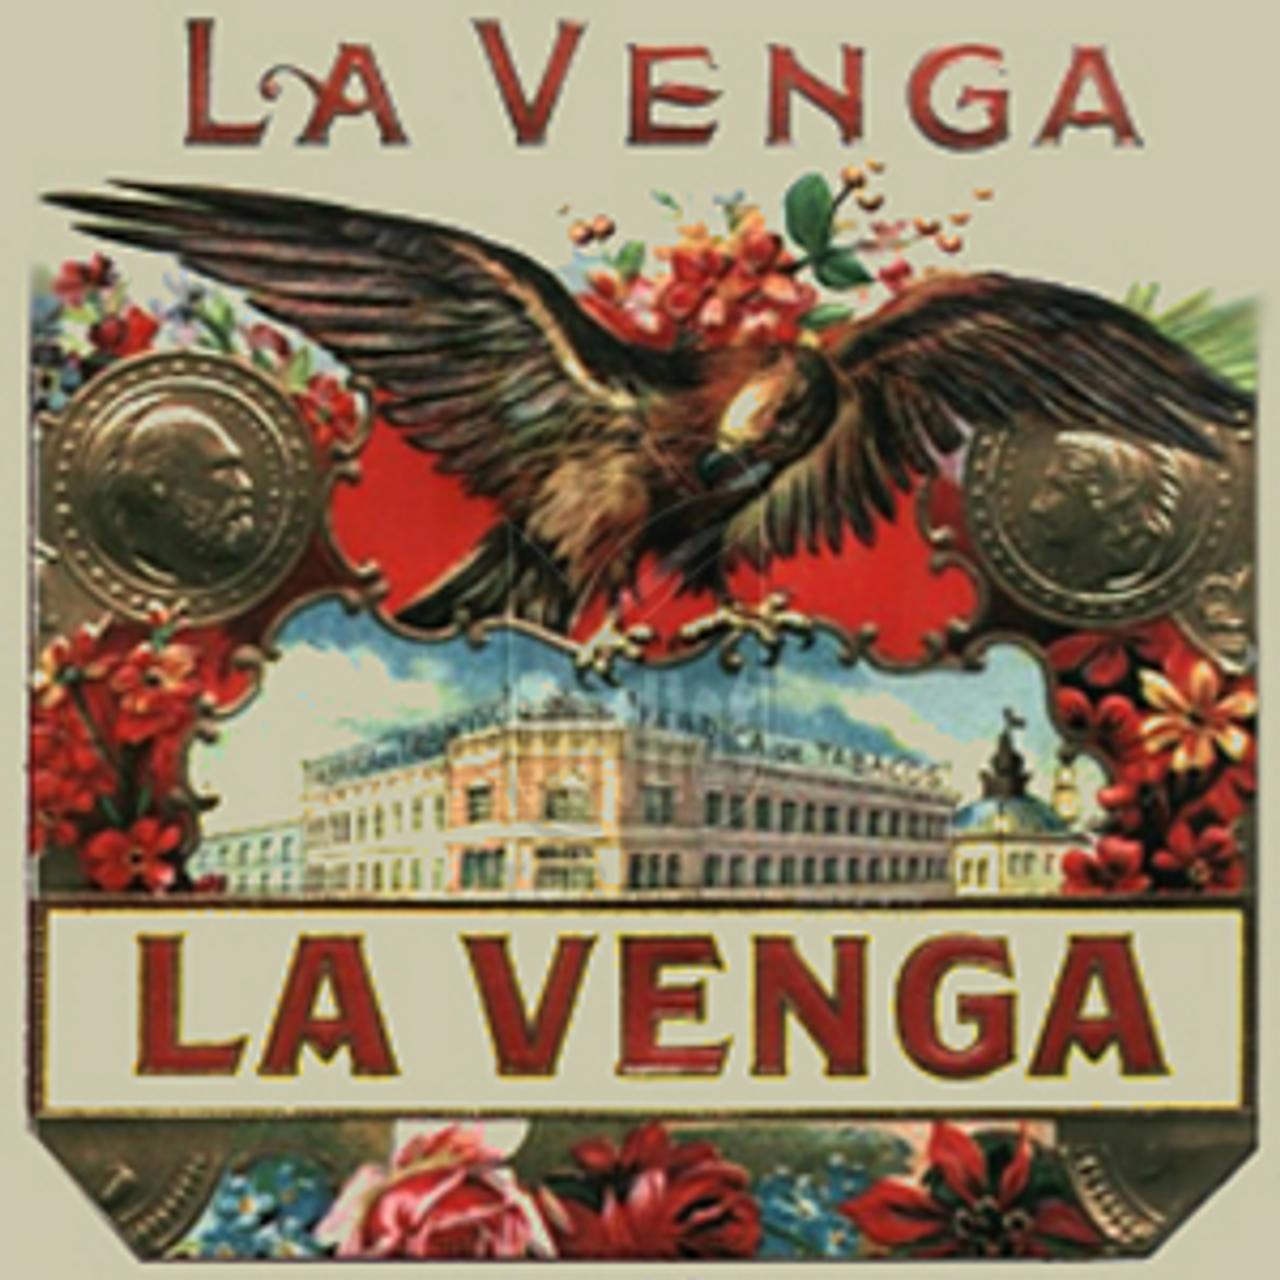 La Venga No.60 Natural Cigars - 6 1/4 x 44 (Bundle of 20)